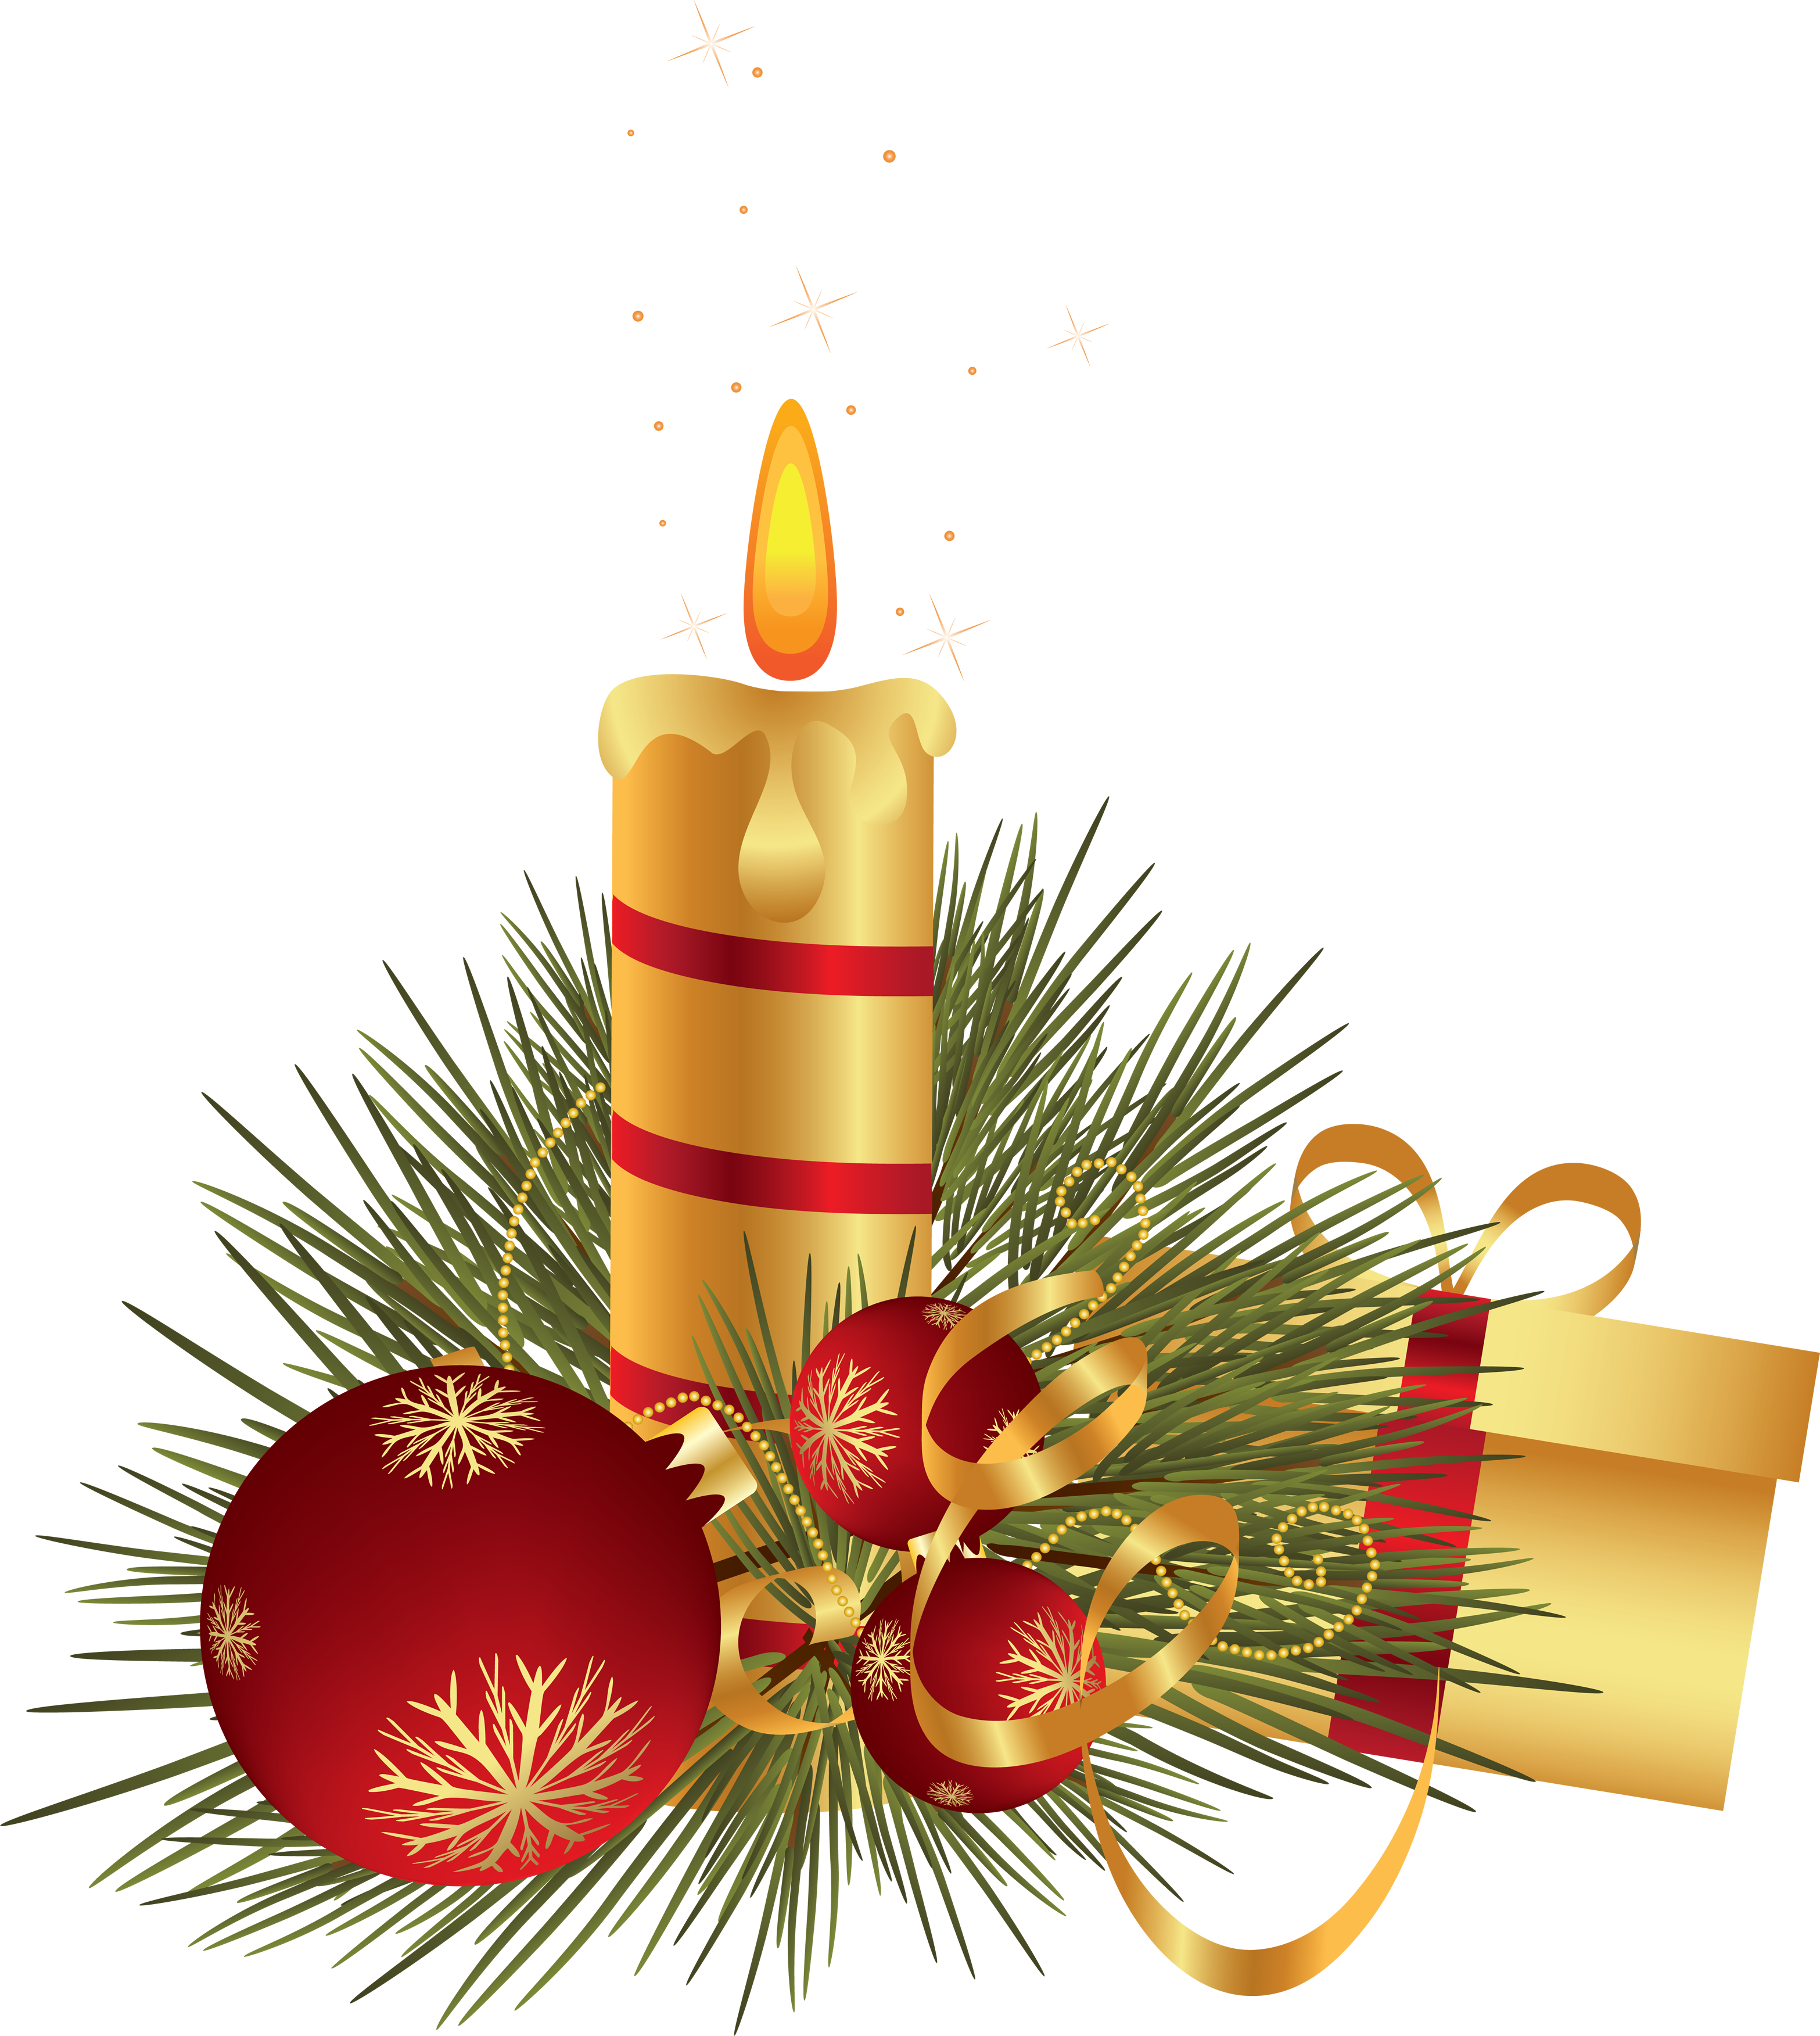 Christmas Candle's PNG Image.